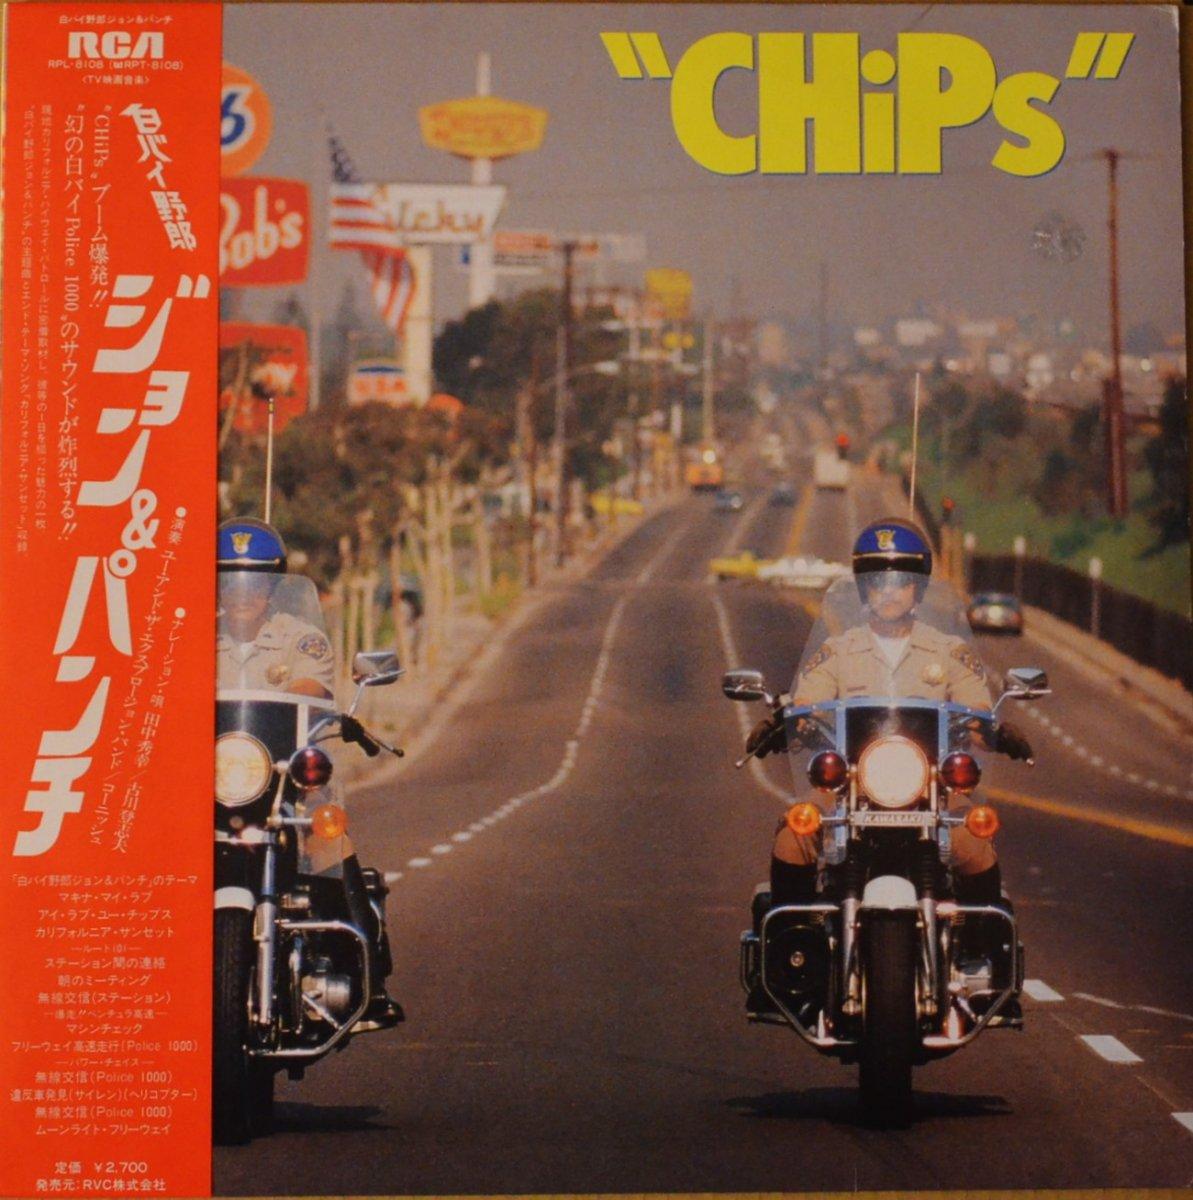 O.S.T.(YUJI OHNO 大野雄二 & ユー・アンド・エクスプロージョン・バンド) / CHIPS (白バイ野郎ジョン&パンチ ) (LP)